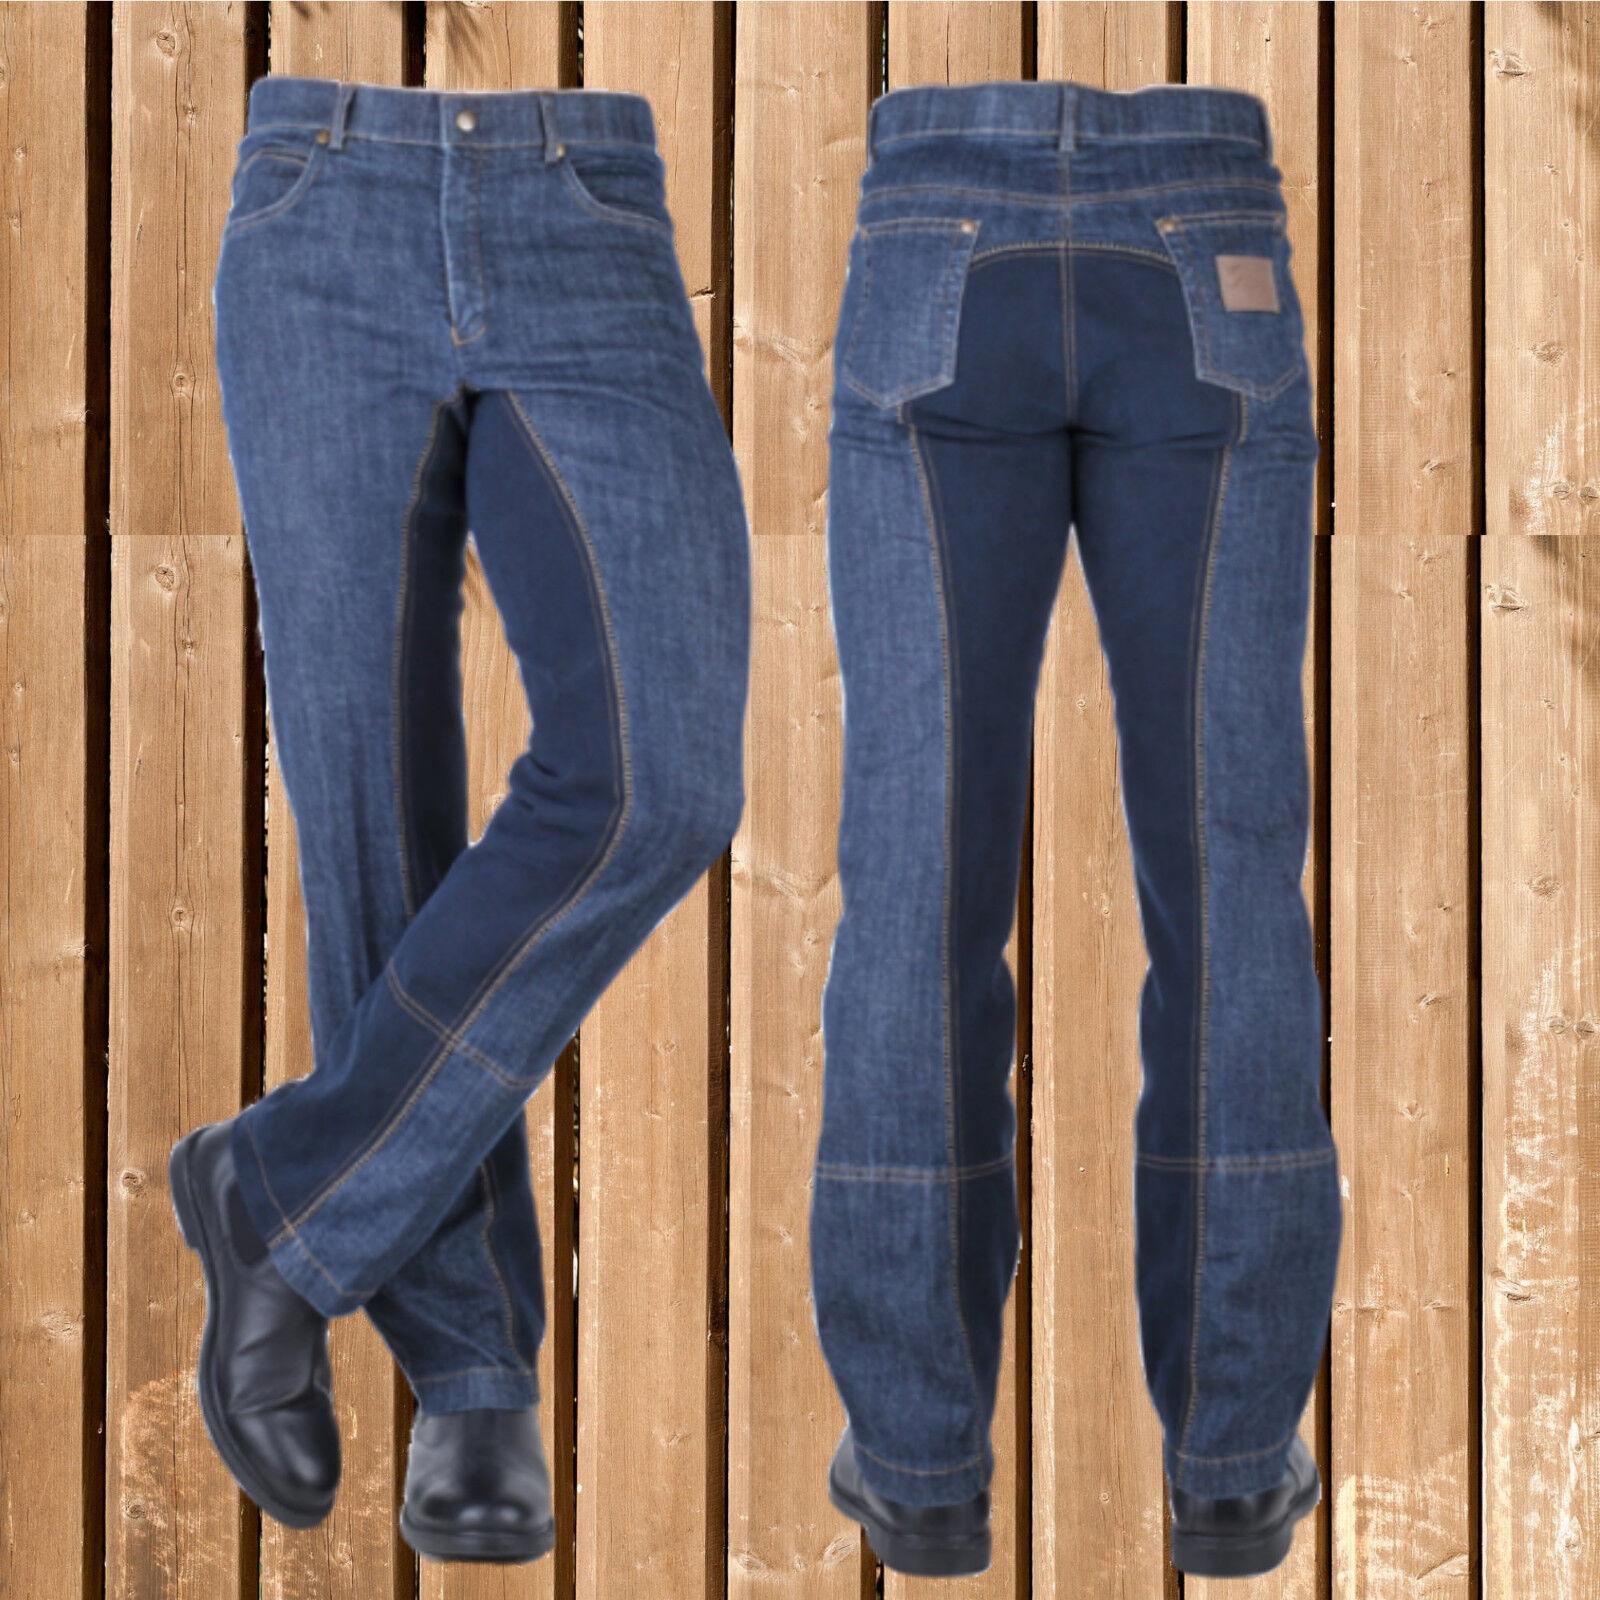 HKM Herren Jeans Jodhpur Reithose Texas, Men, Jeans Jeans Men, Männer Jodhpur Reithose 59ad35